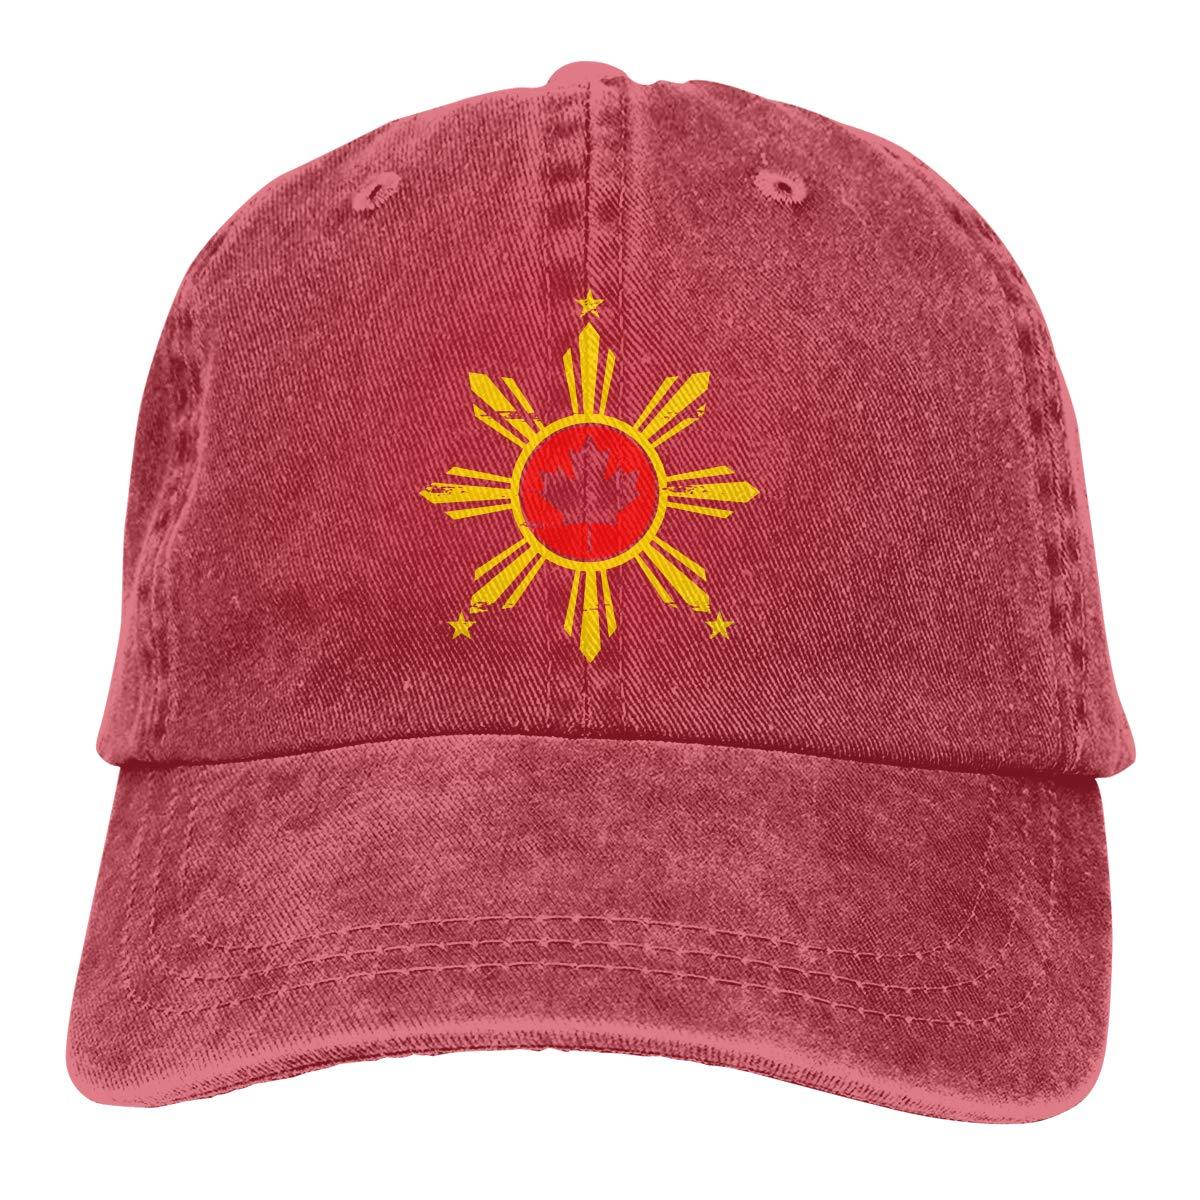 BH Cool Designs #palmbay Comfortable Dad Hat Baseball Cap